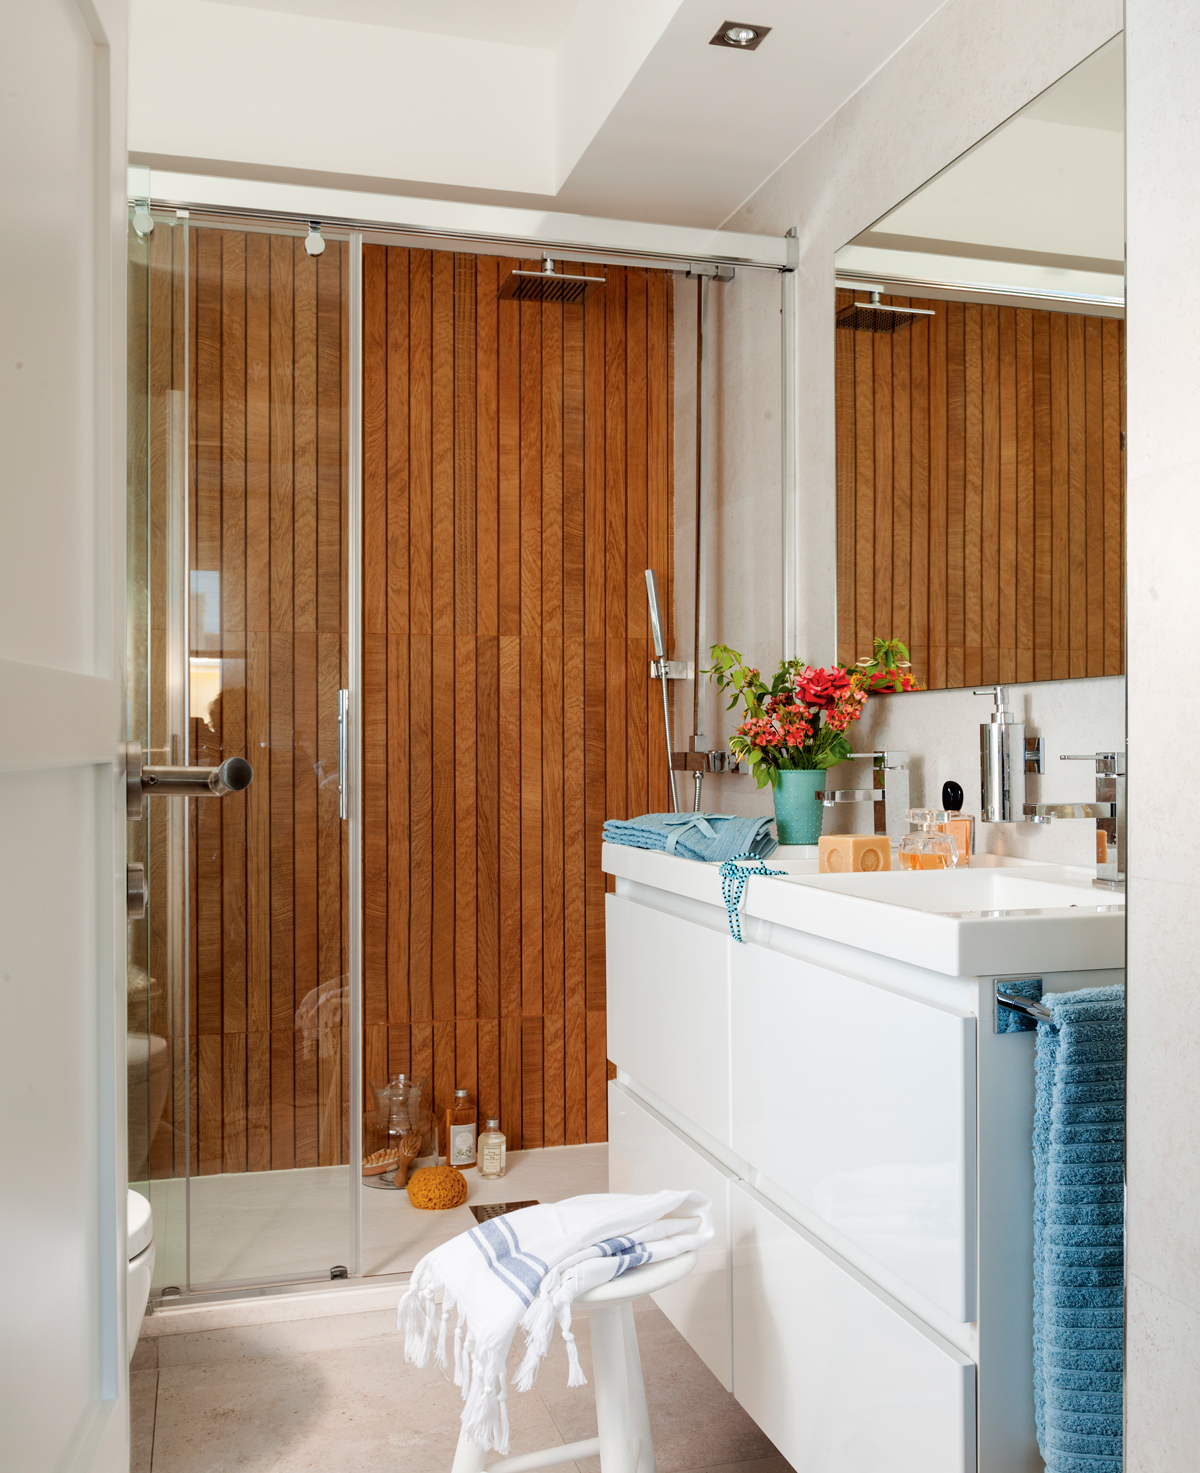 Muebles perfectos para ba os peque os for Revestimiento pared imitacion madera